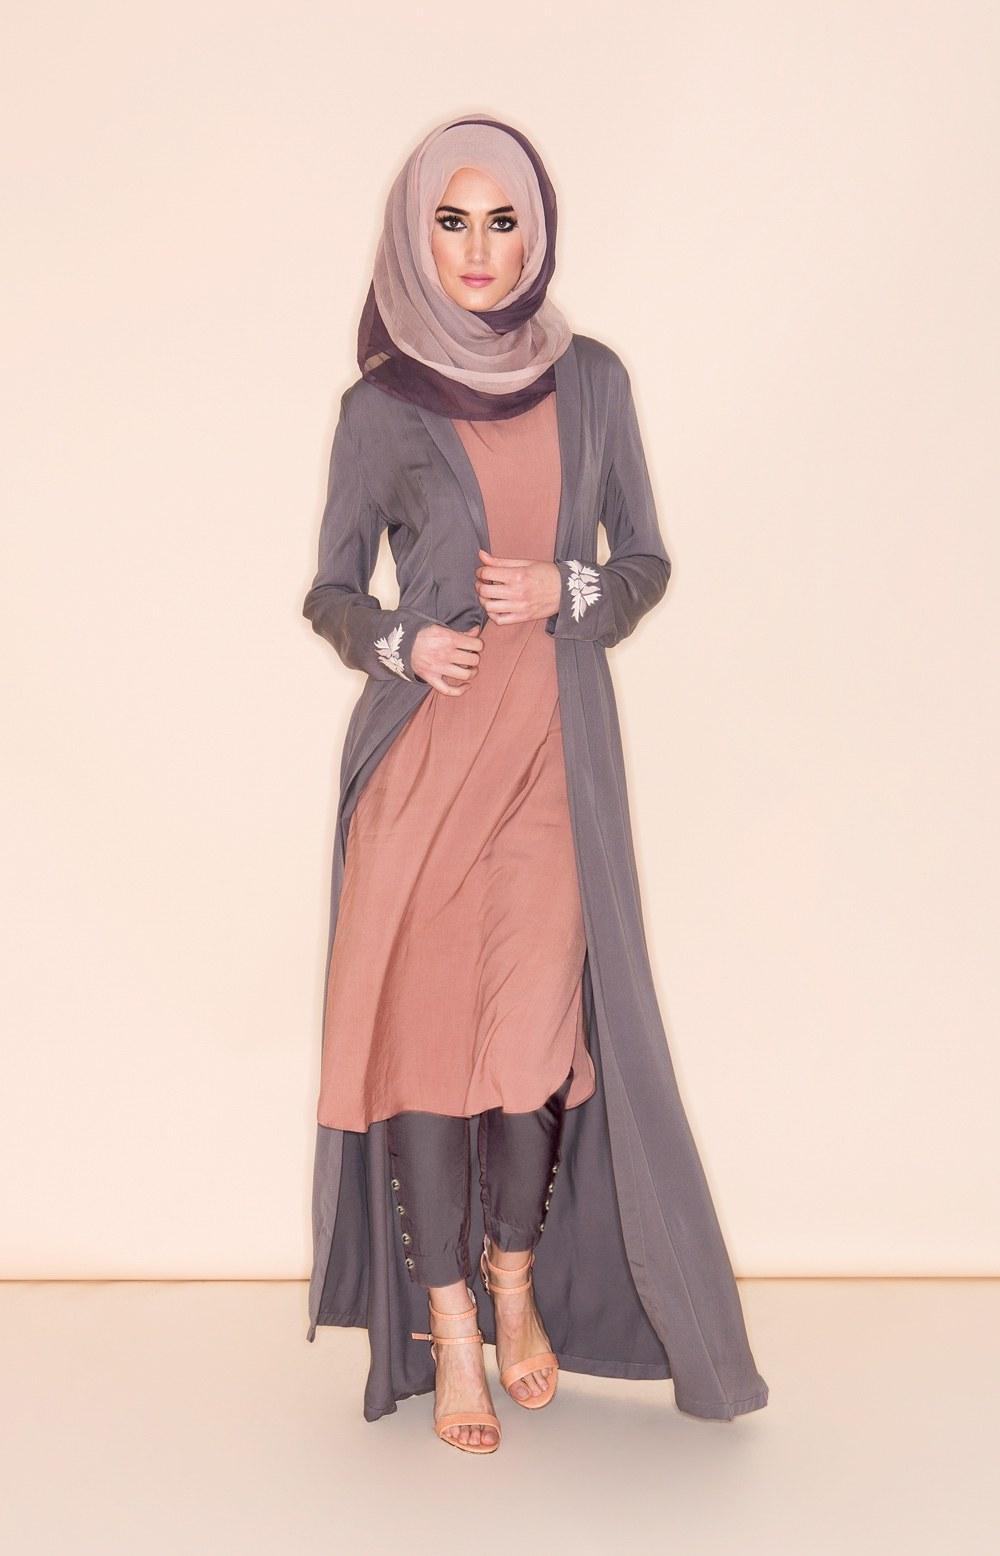 Bentuk Fashion Muslimah Terbaru 2020 Rldj 10 Contoh Model Baju Muslim Terbaru 2018